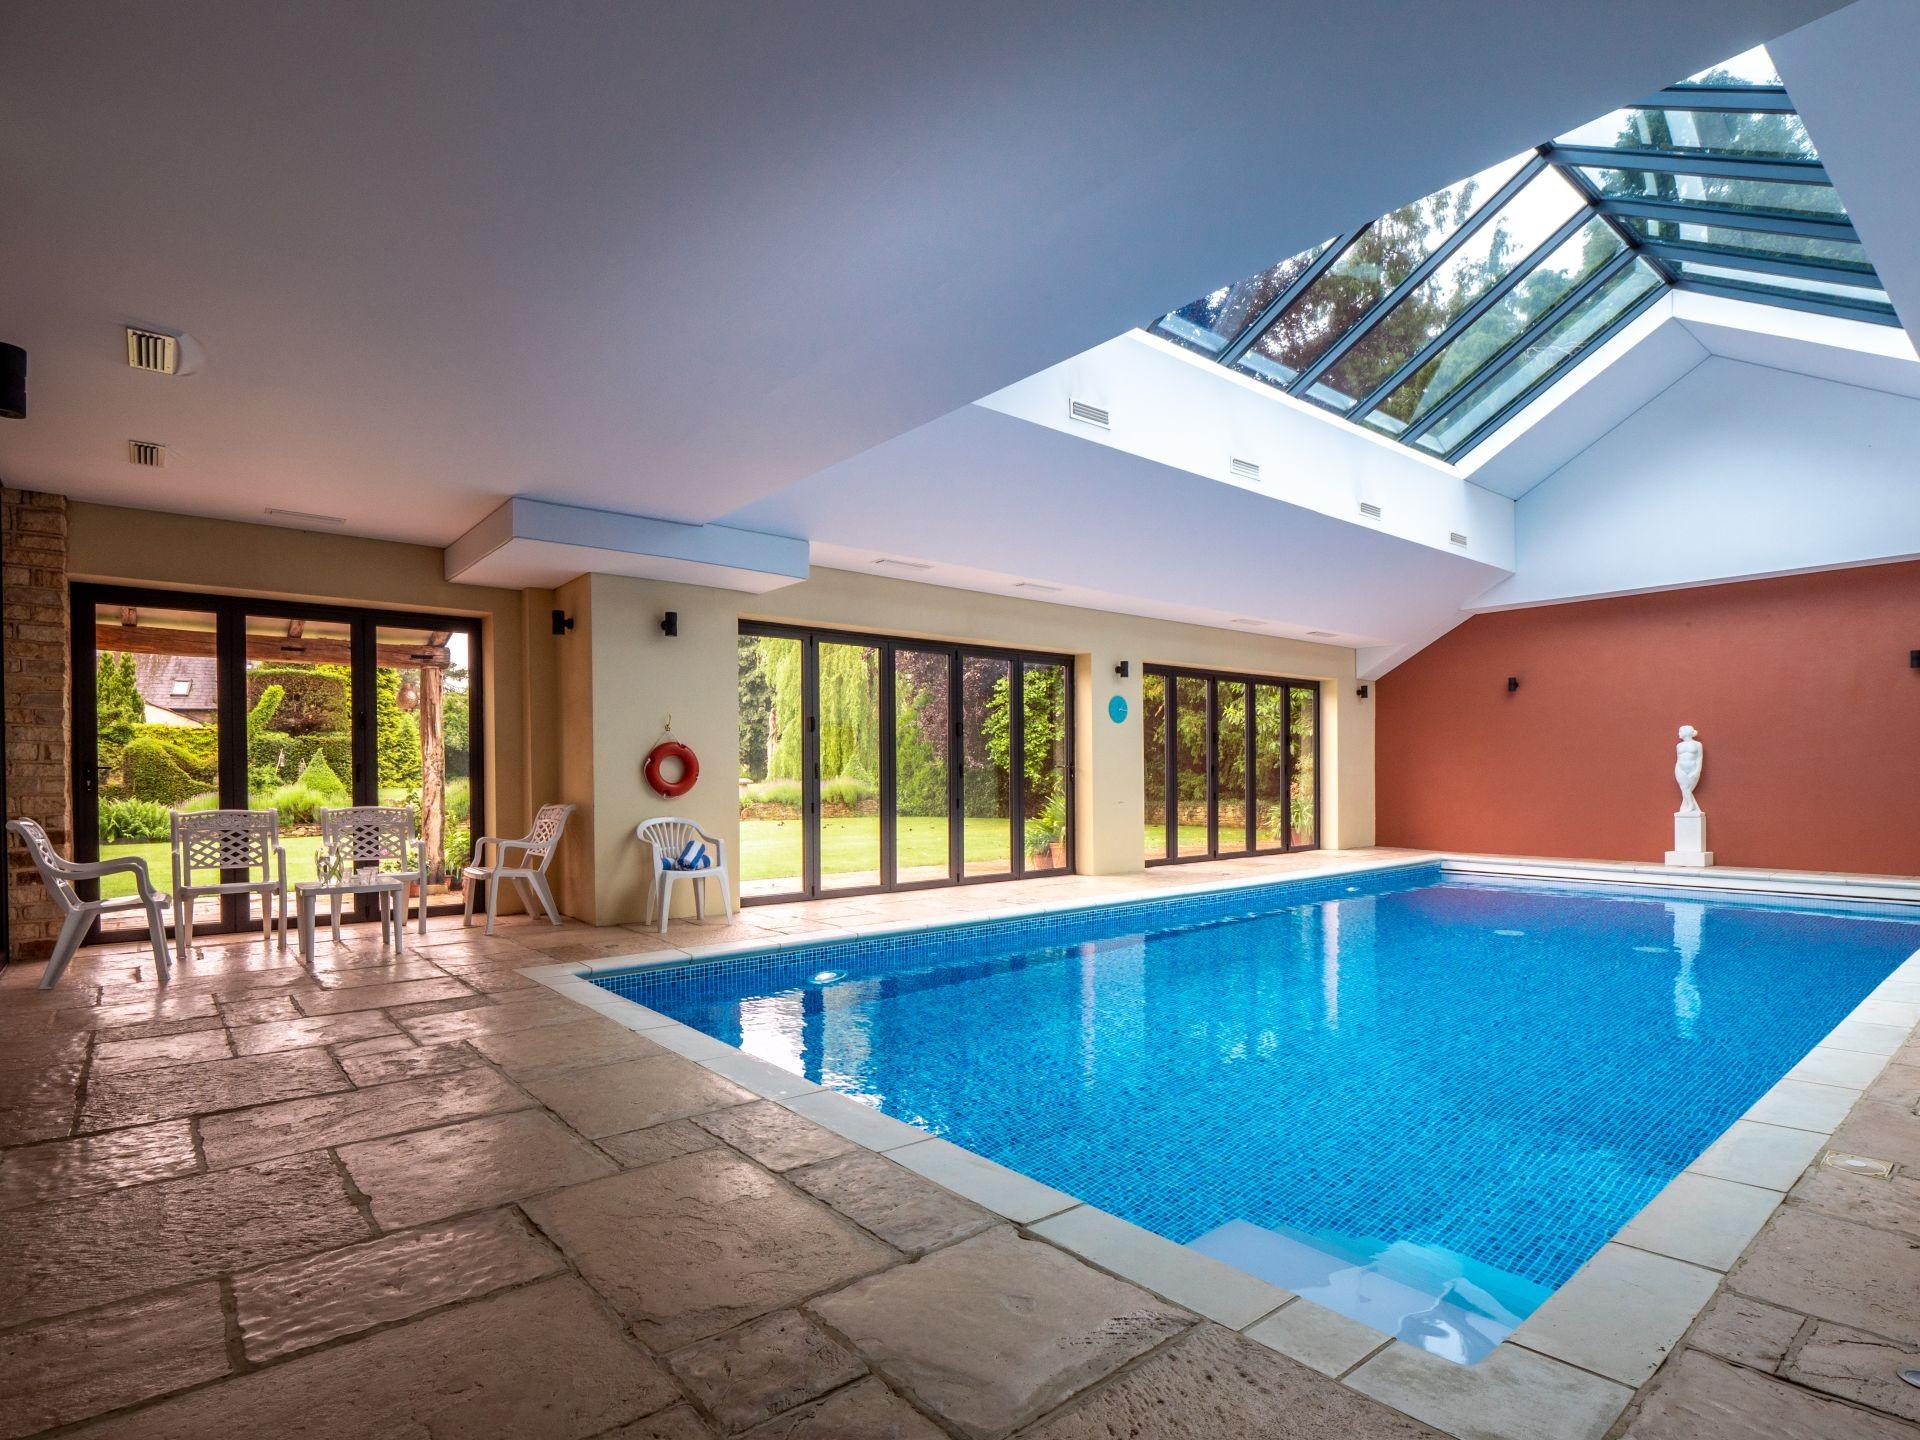 Indoor, heated swimming pool